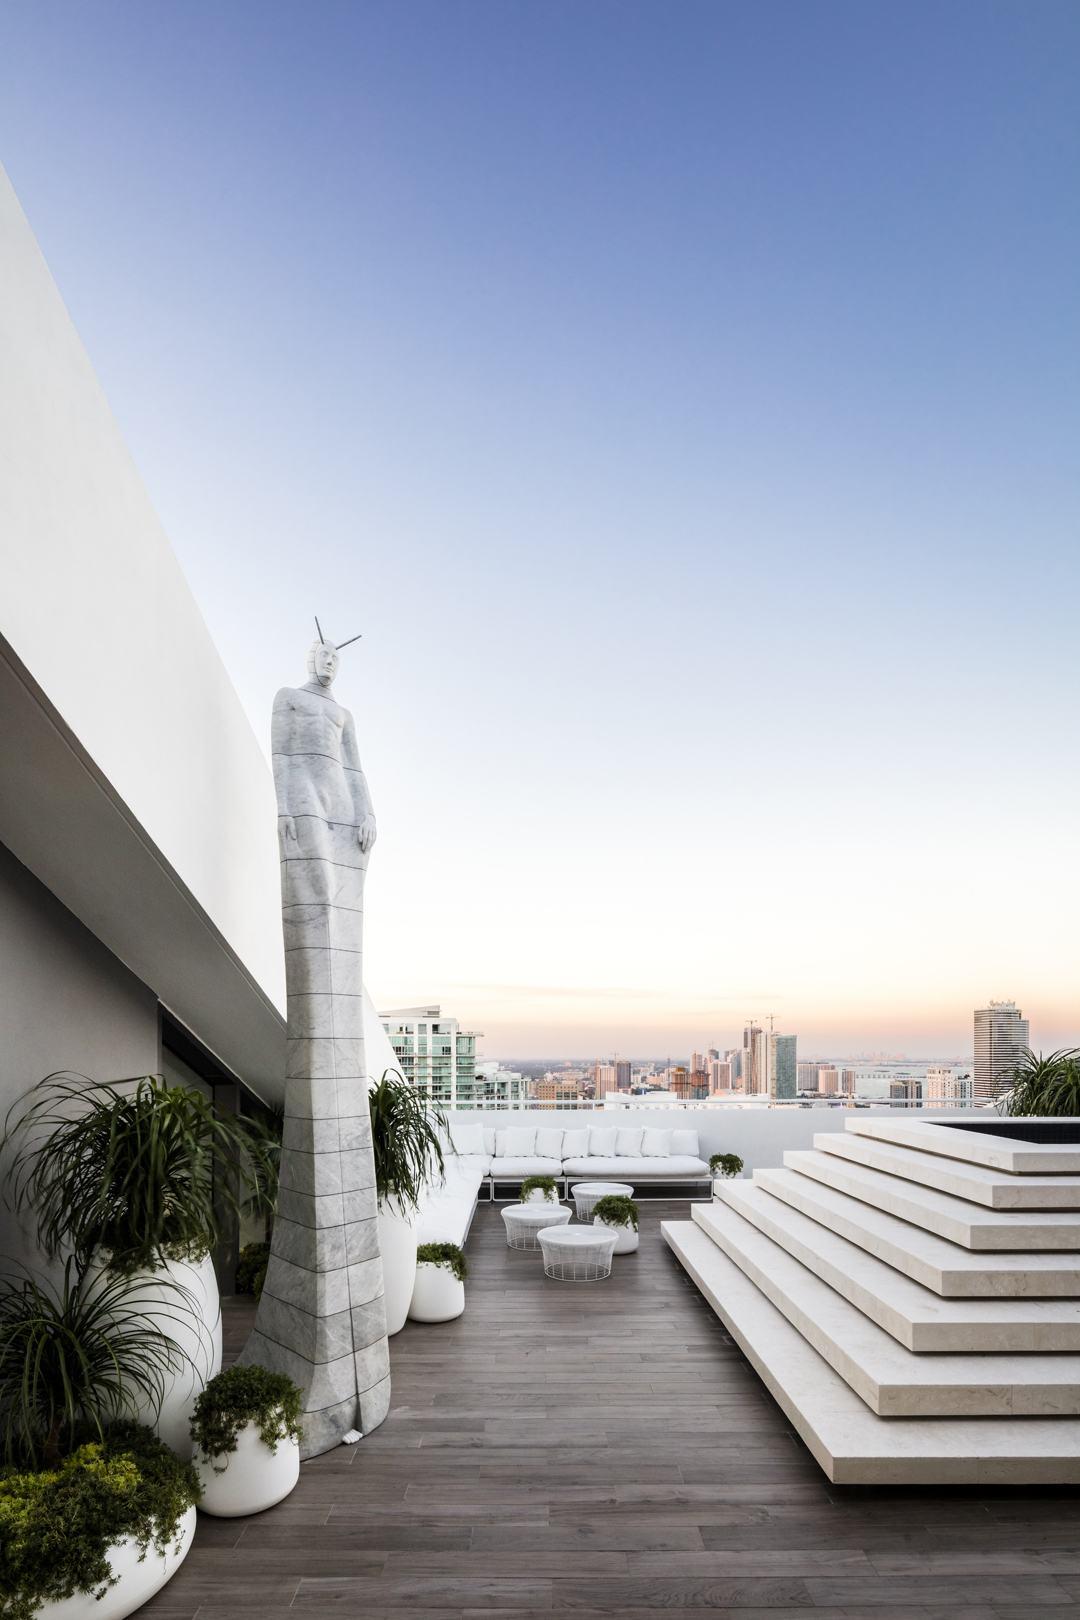 Casacor Miami showroom - Fernando Wong, landscape architect